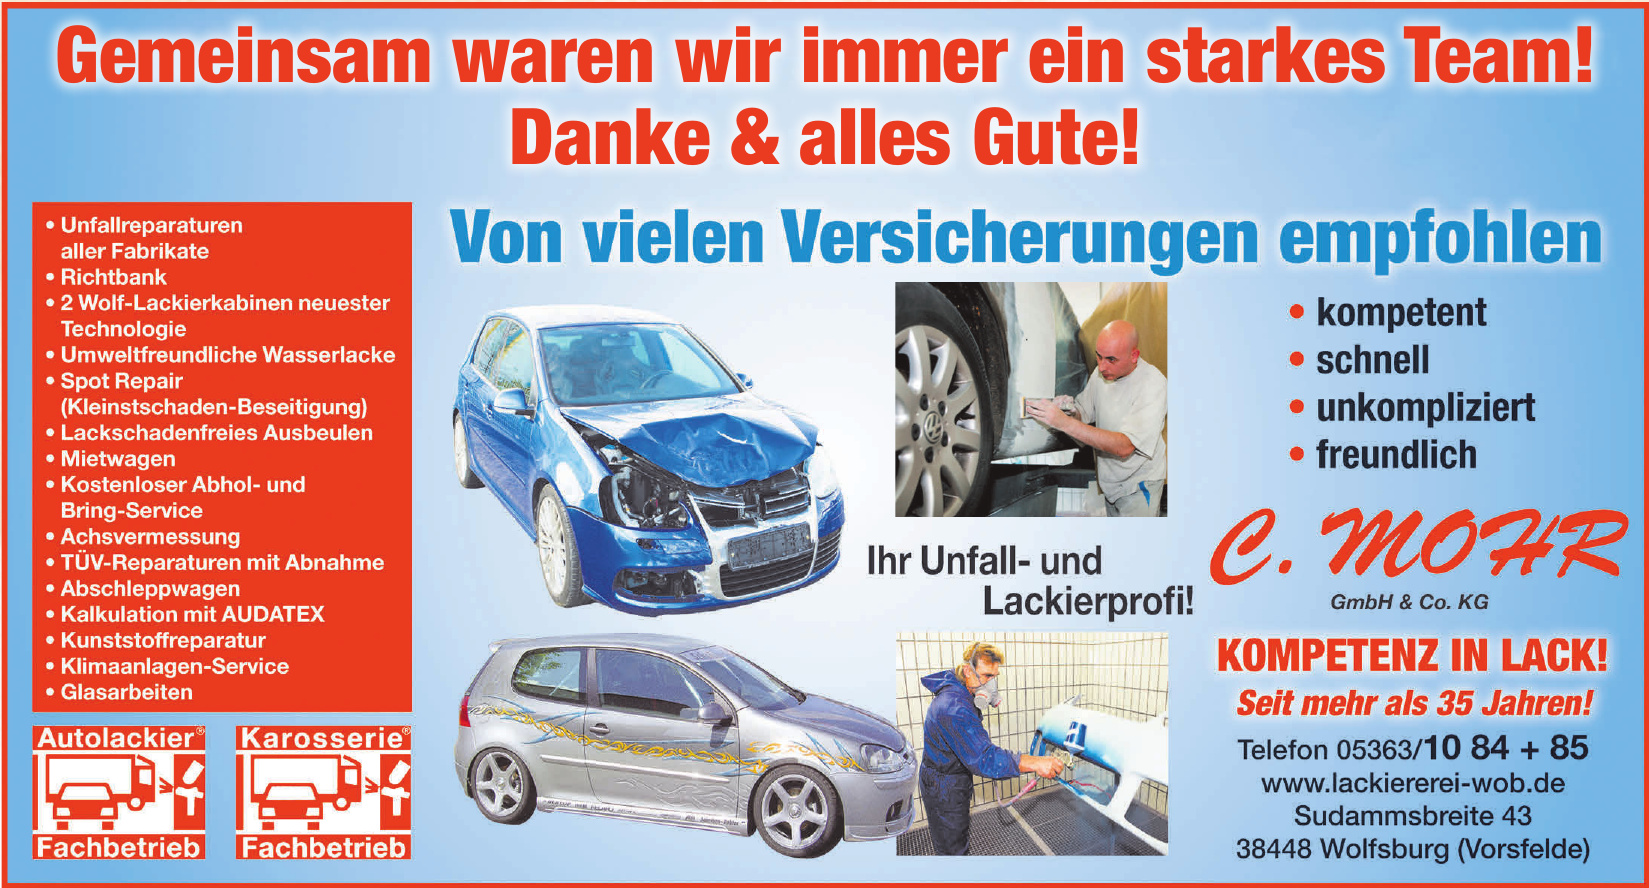 C. Mohr GmbH & Co. KG